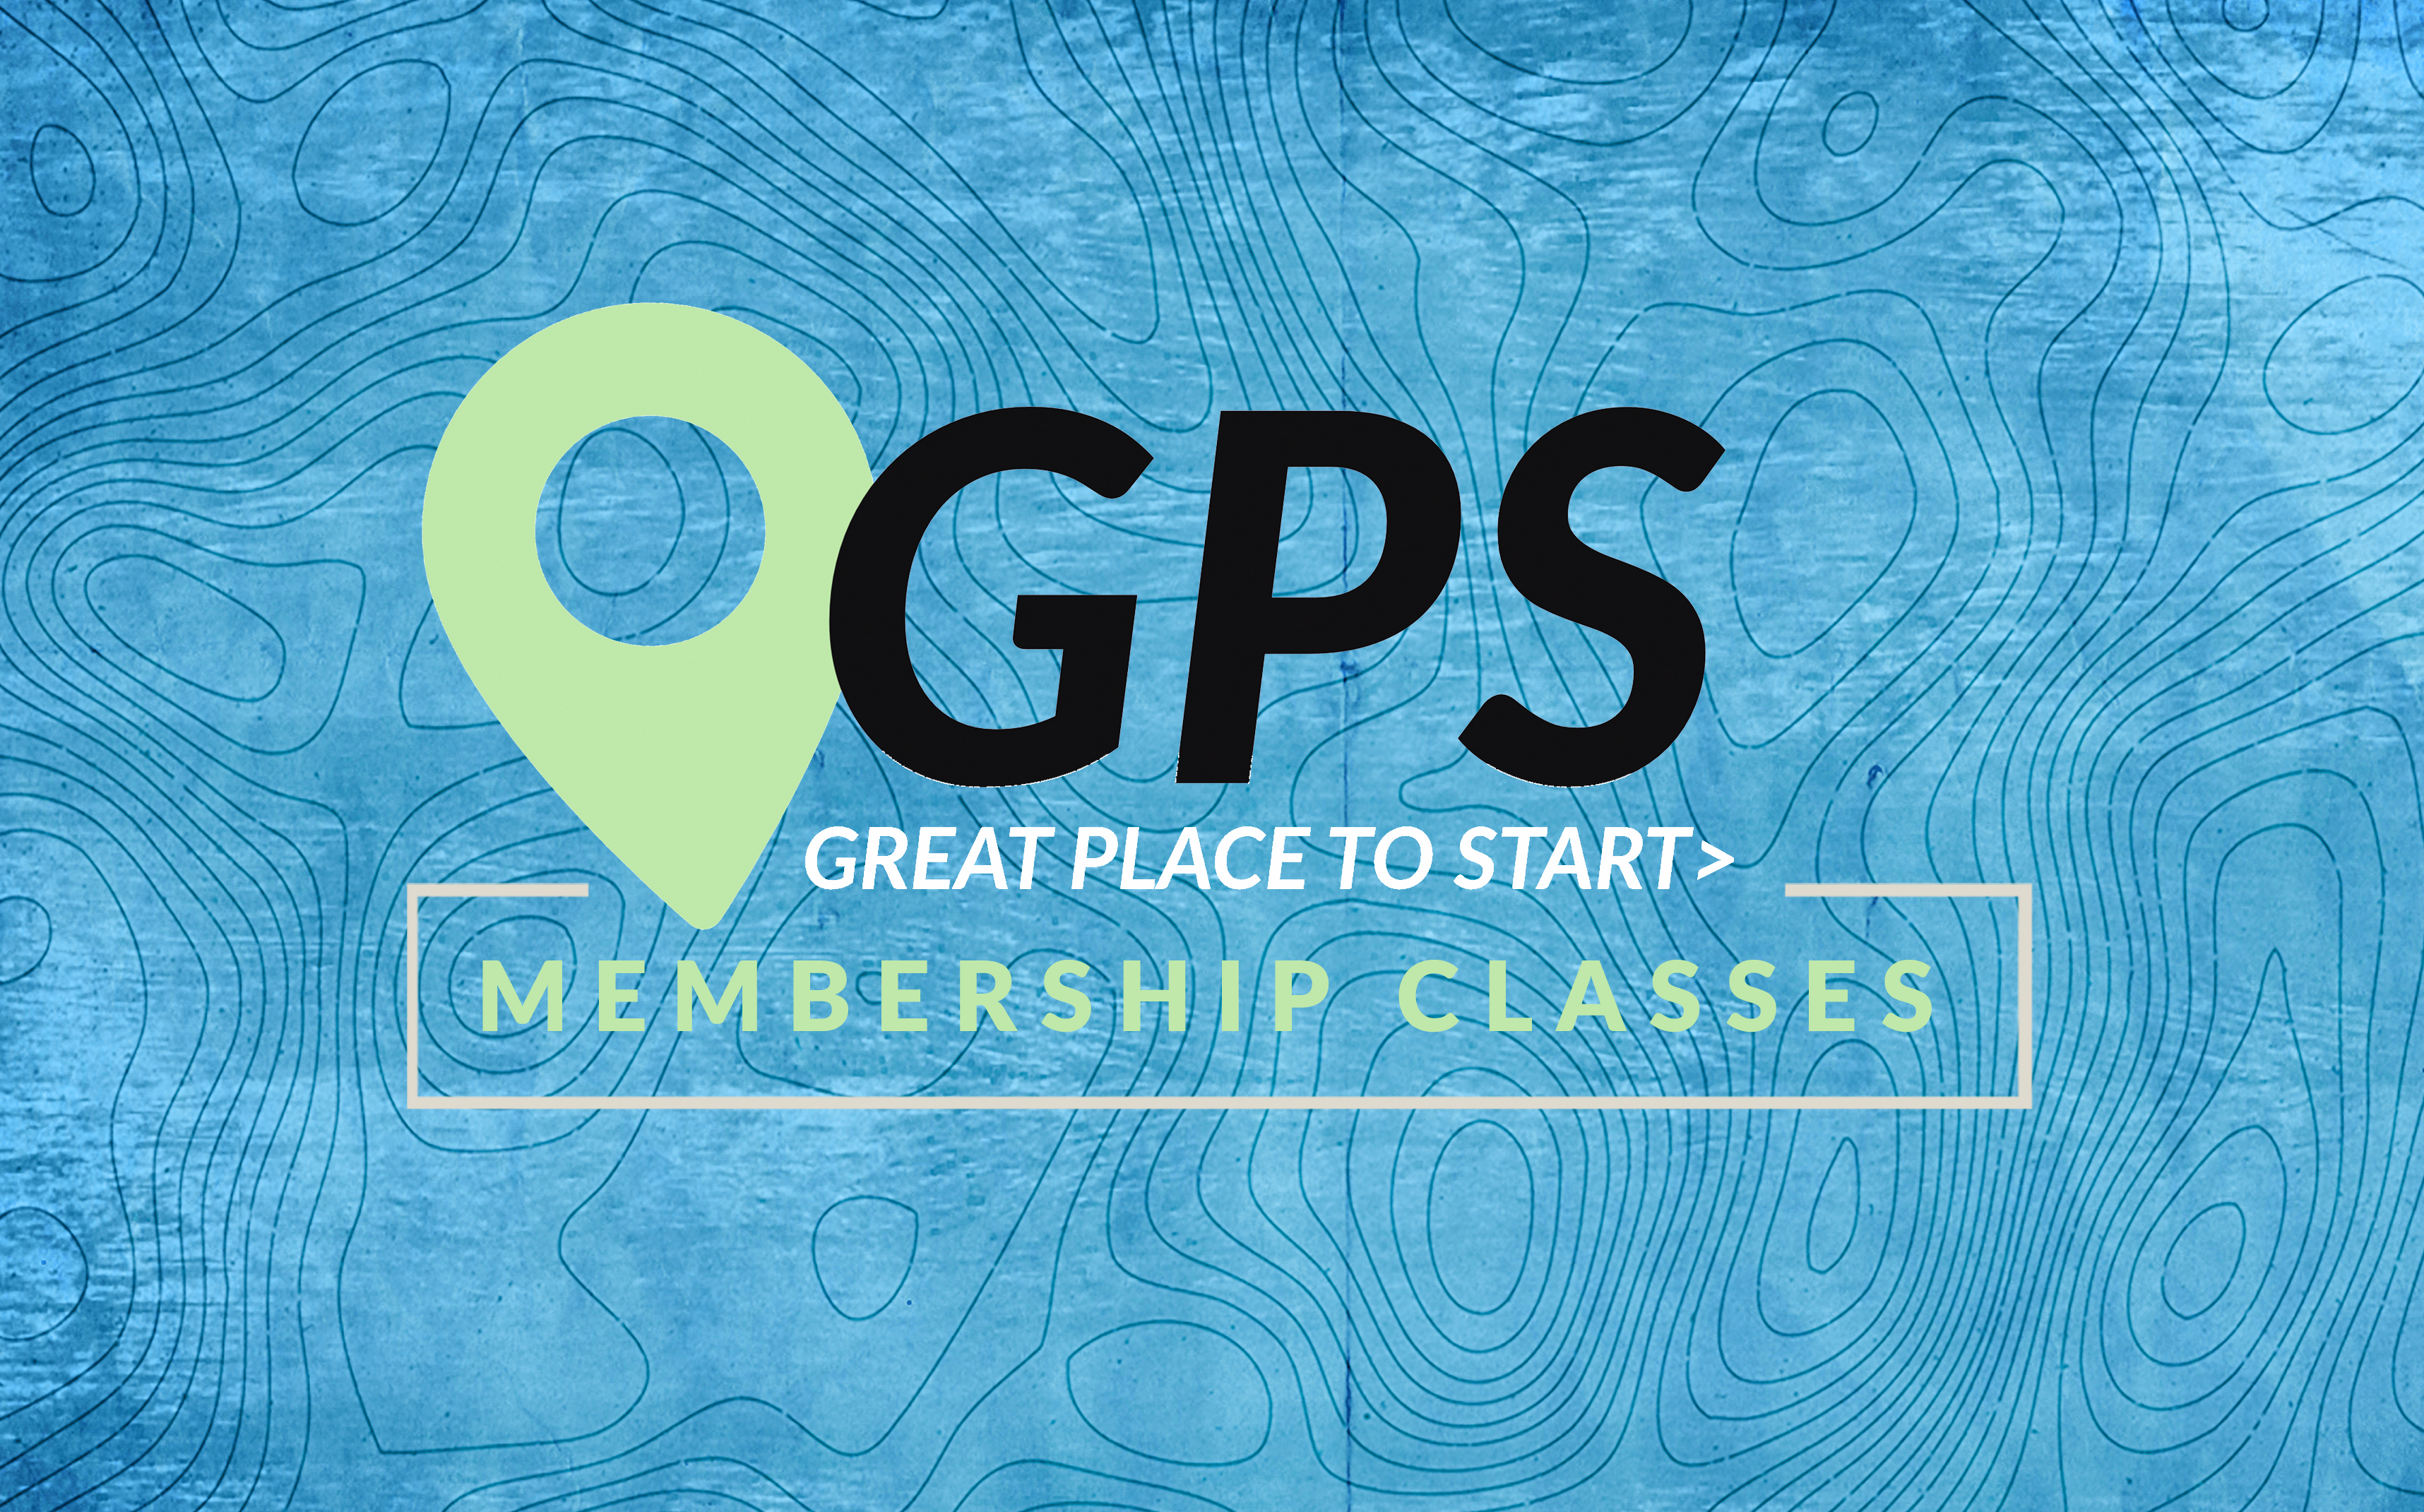 Gps  great place to start  membership class